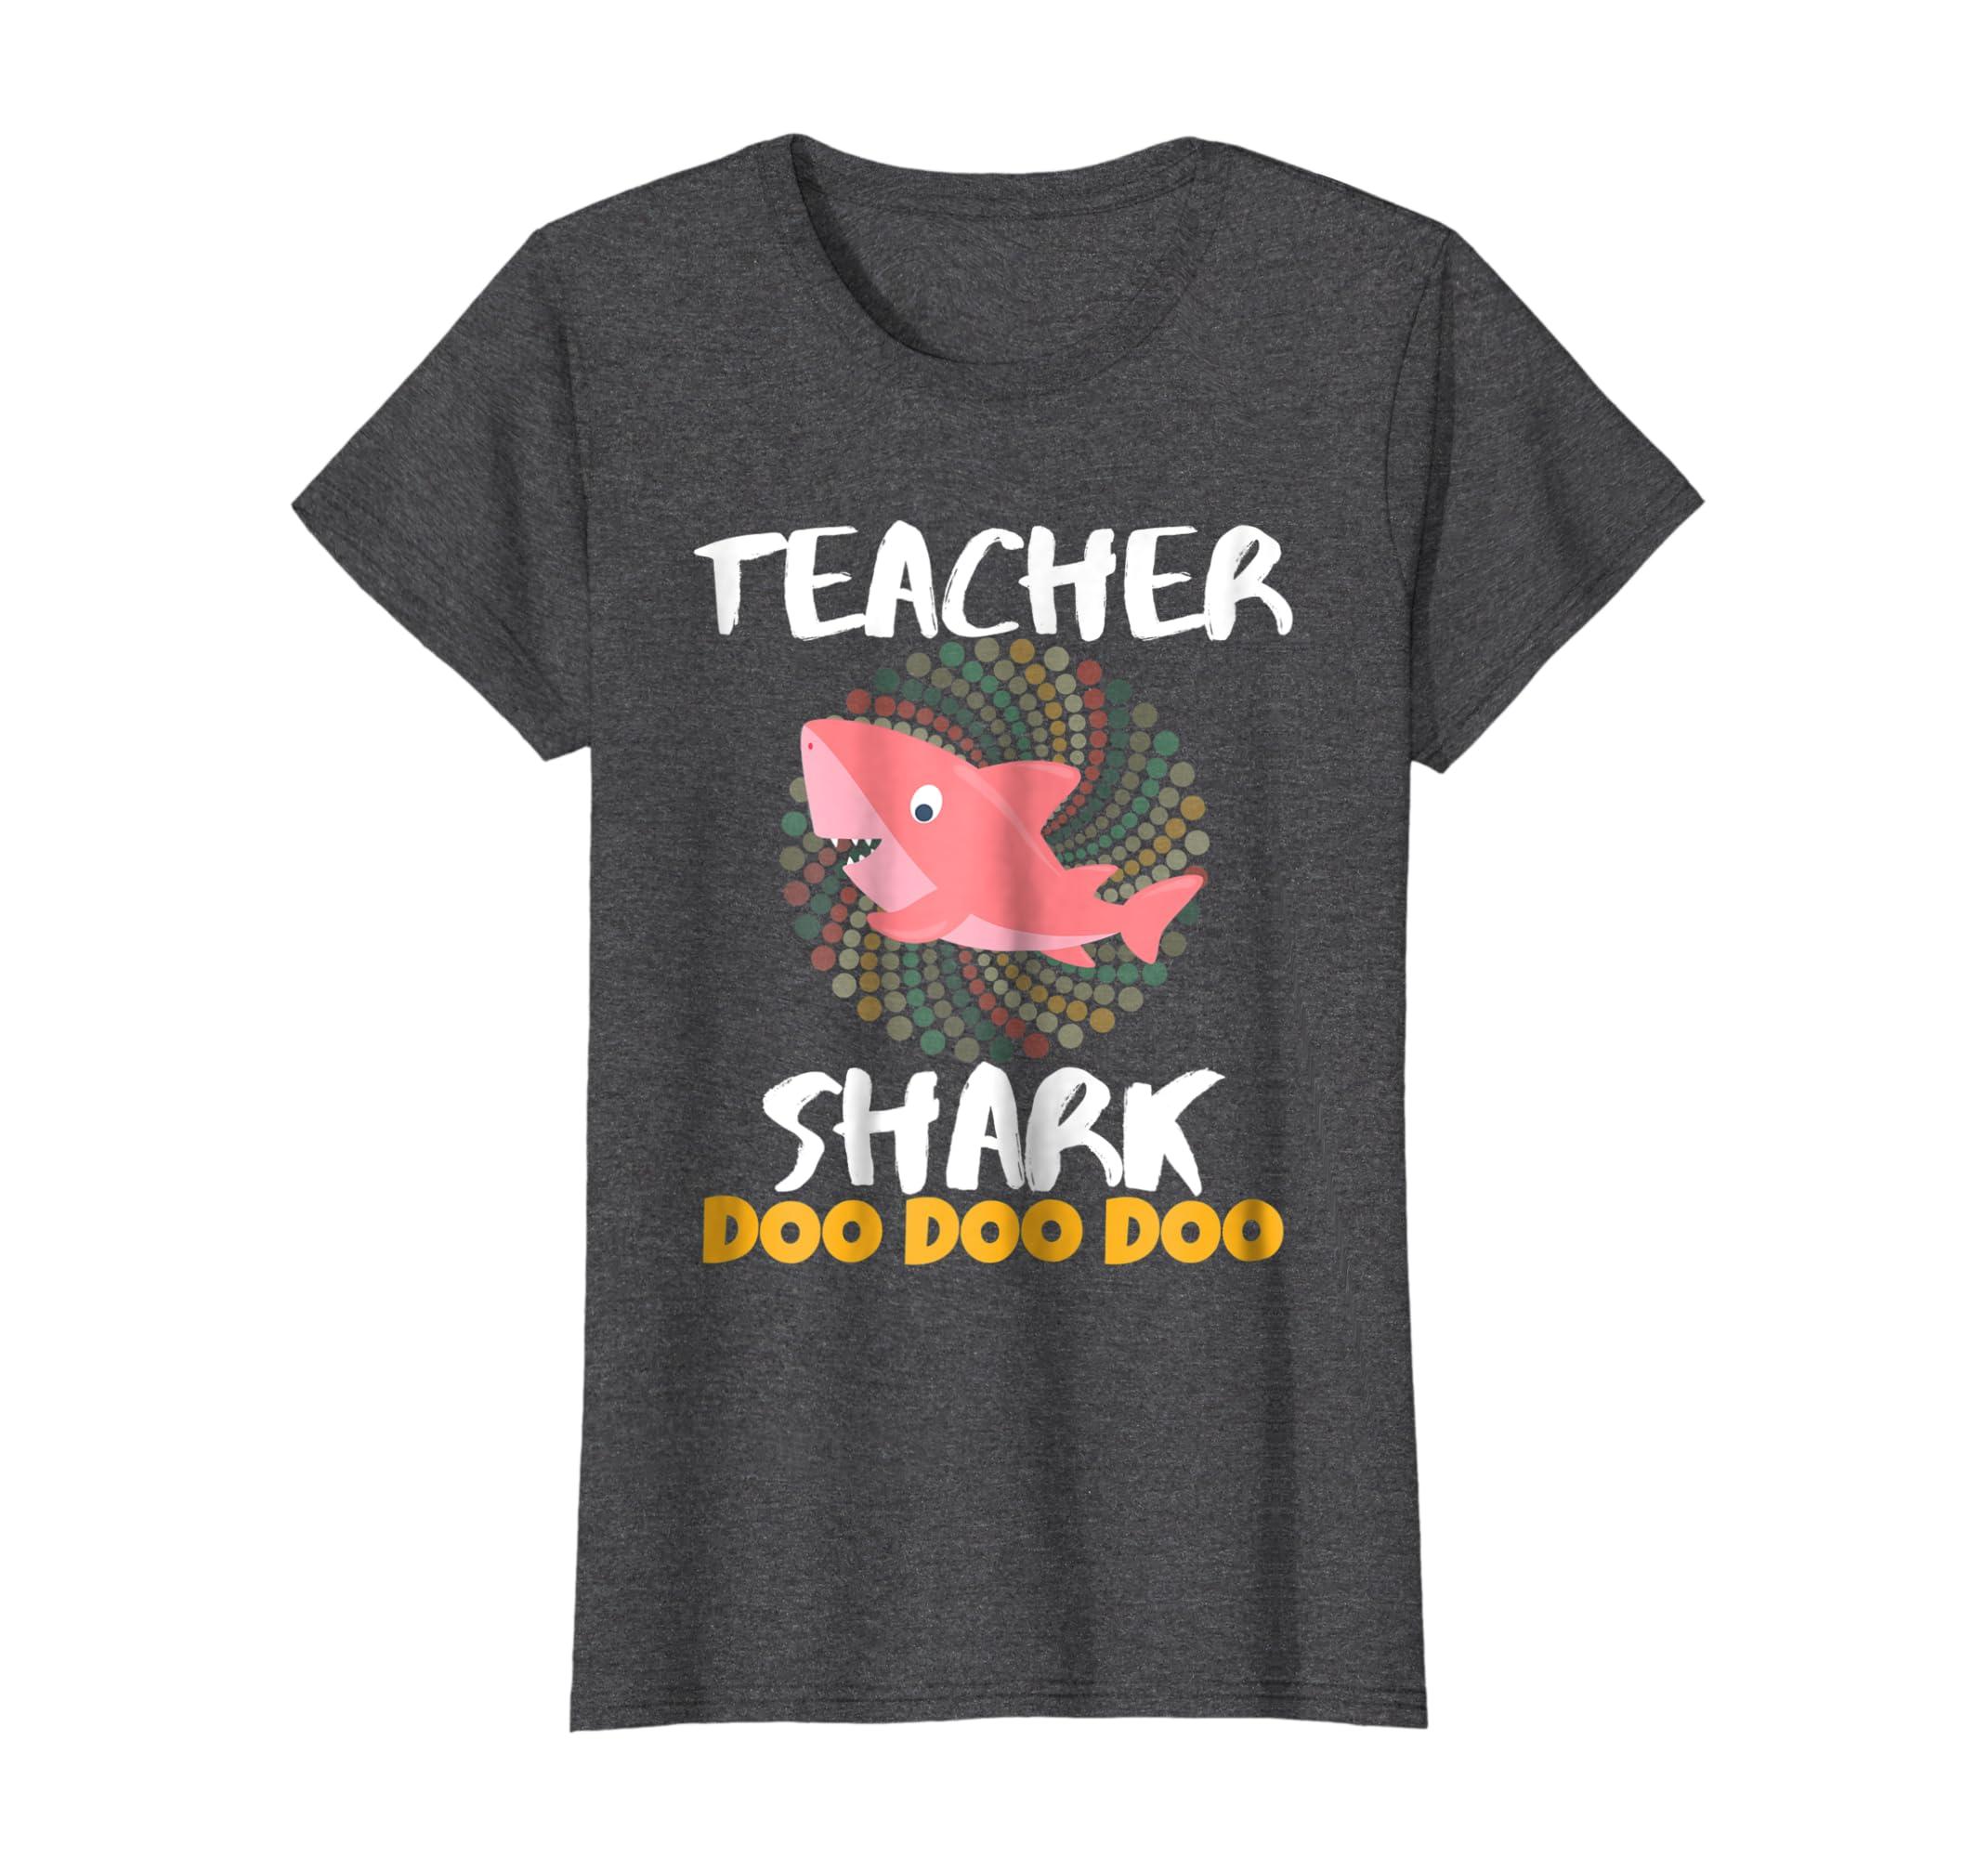 Christmas Gift Exchange Themes.Amazon Com Womens Teacher Shark Shirt Best Christmas Gift